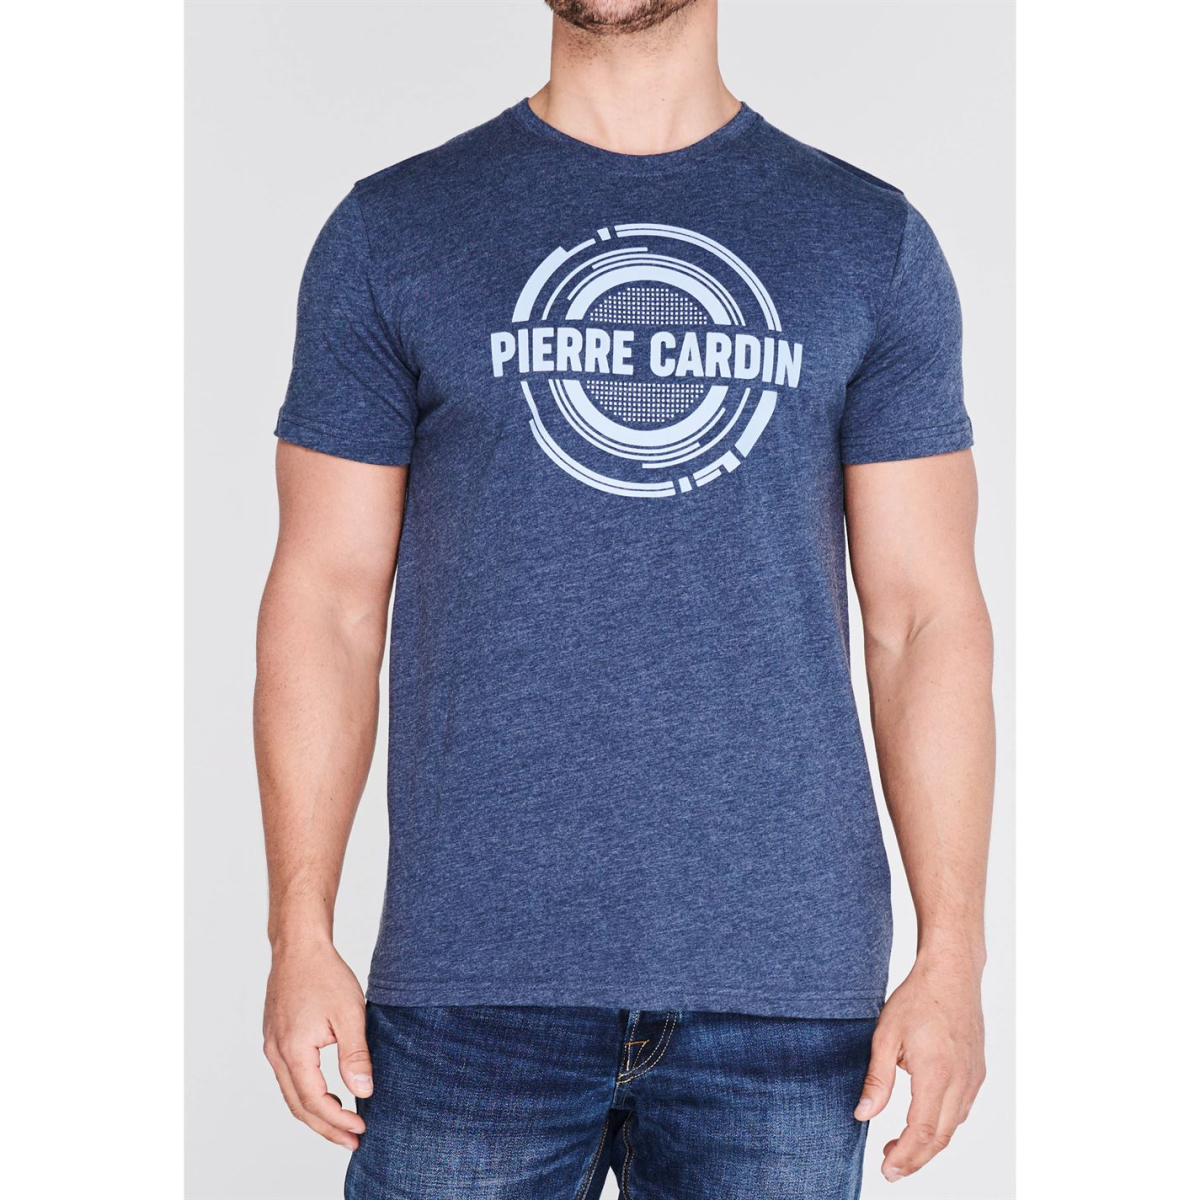 Pierre Cardin Herren T-shirt Tshirt T Shirt Kurzarm Freizeit 7292